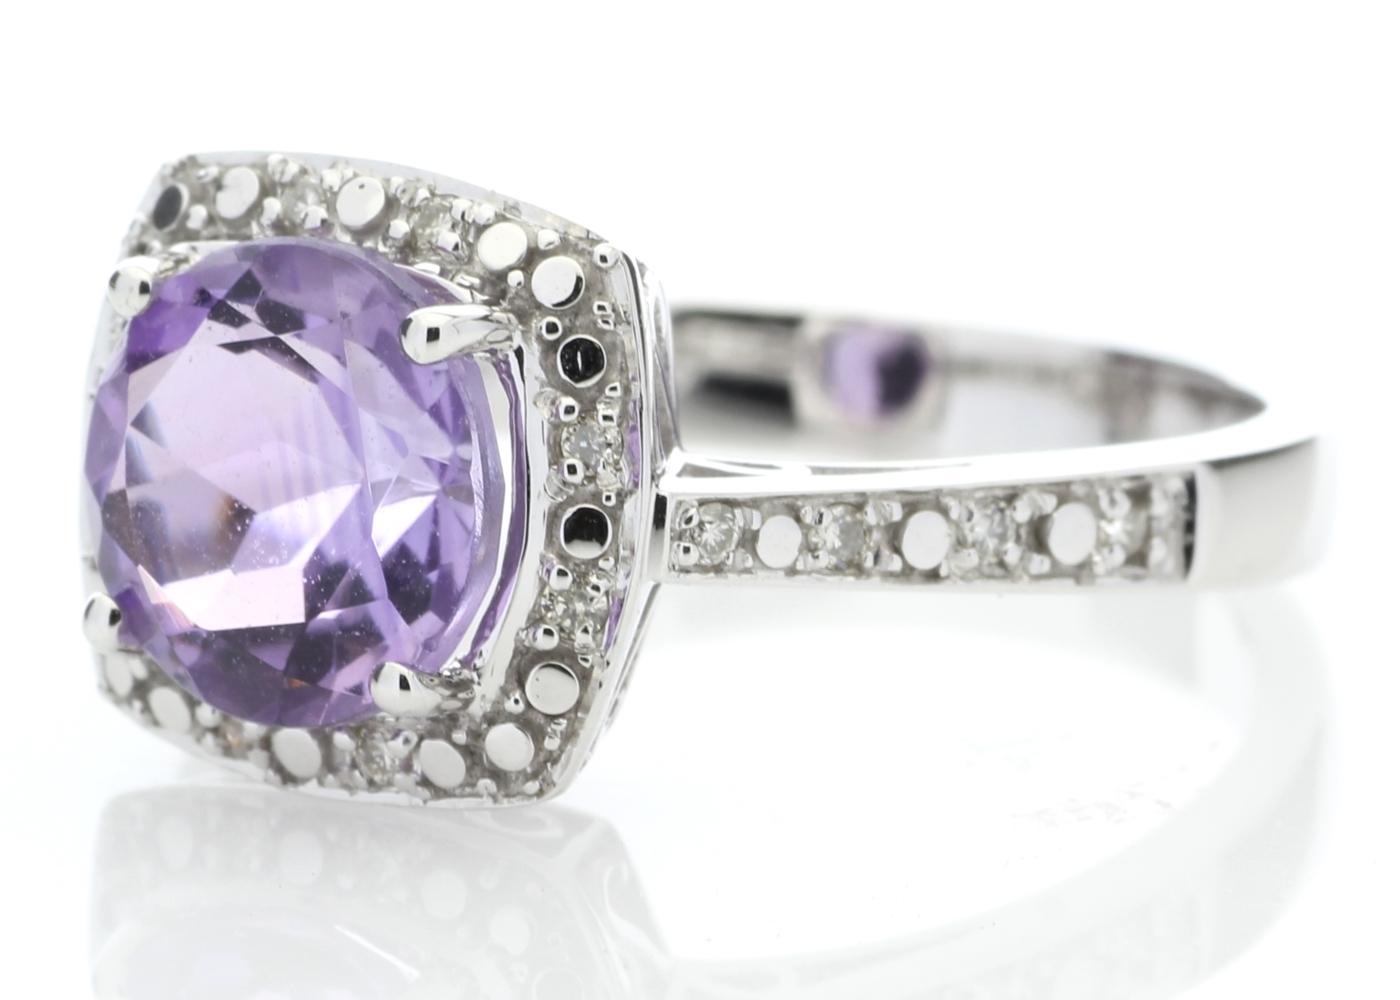 Lot 57 - 9ct White Gold Amethyst Diamond Ring